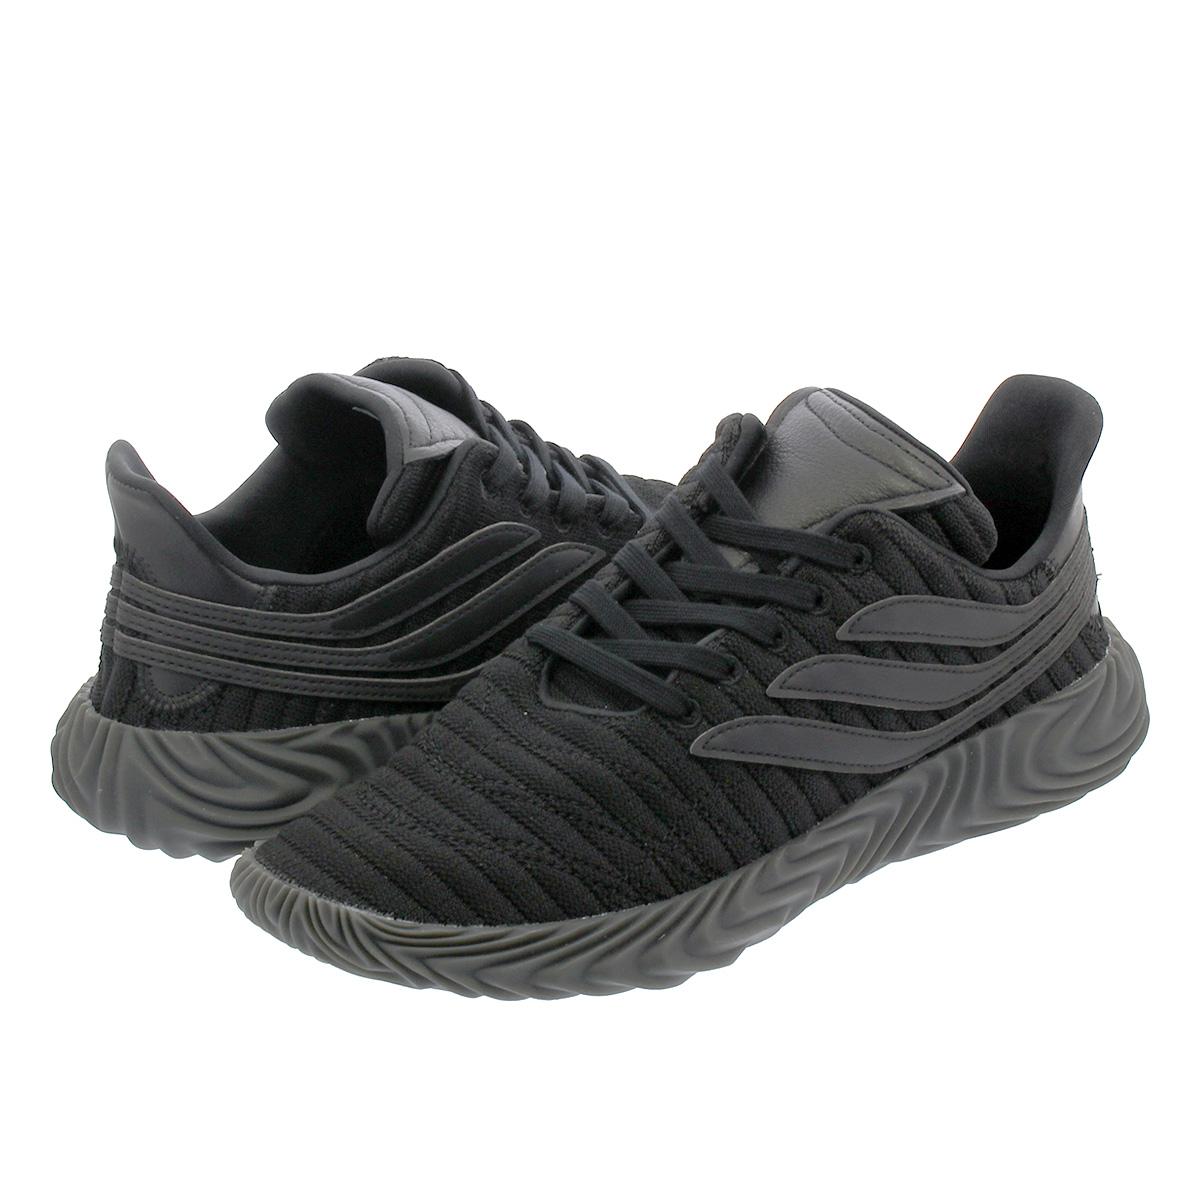 reputable site 5eadf 41bed adidas SOBAKOV アディダスソバコフ CORE BLACK CORE BLACK CORE BLACK b41968 ...